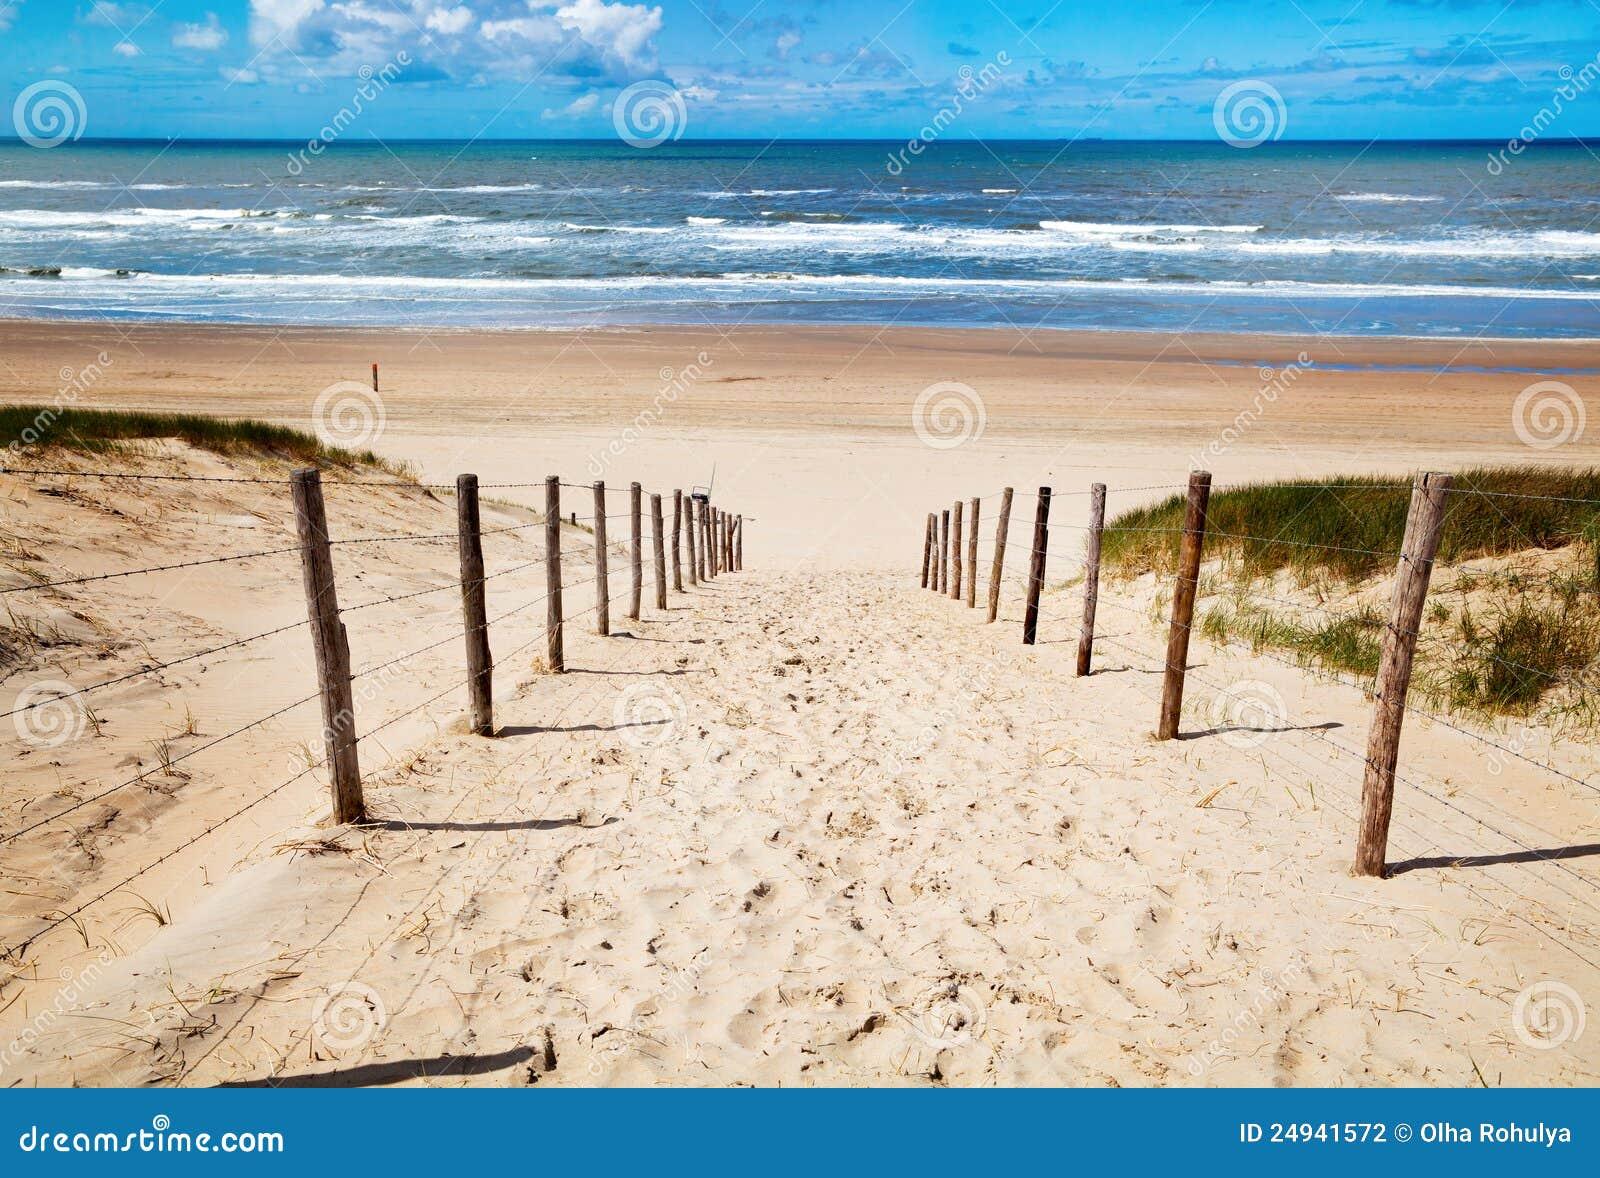 Methode zum Strand